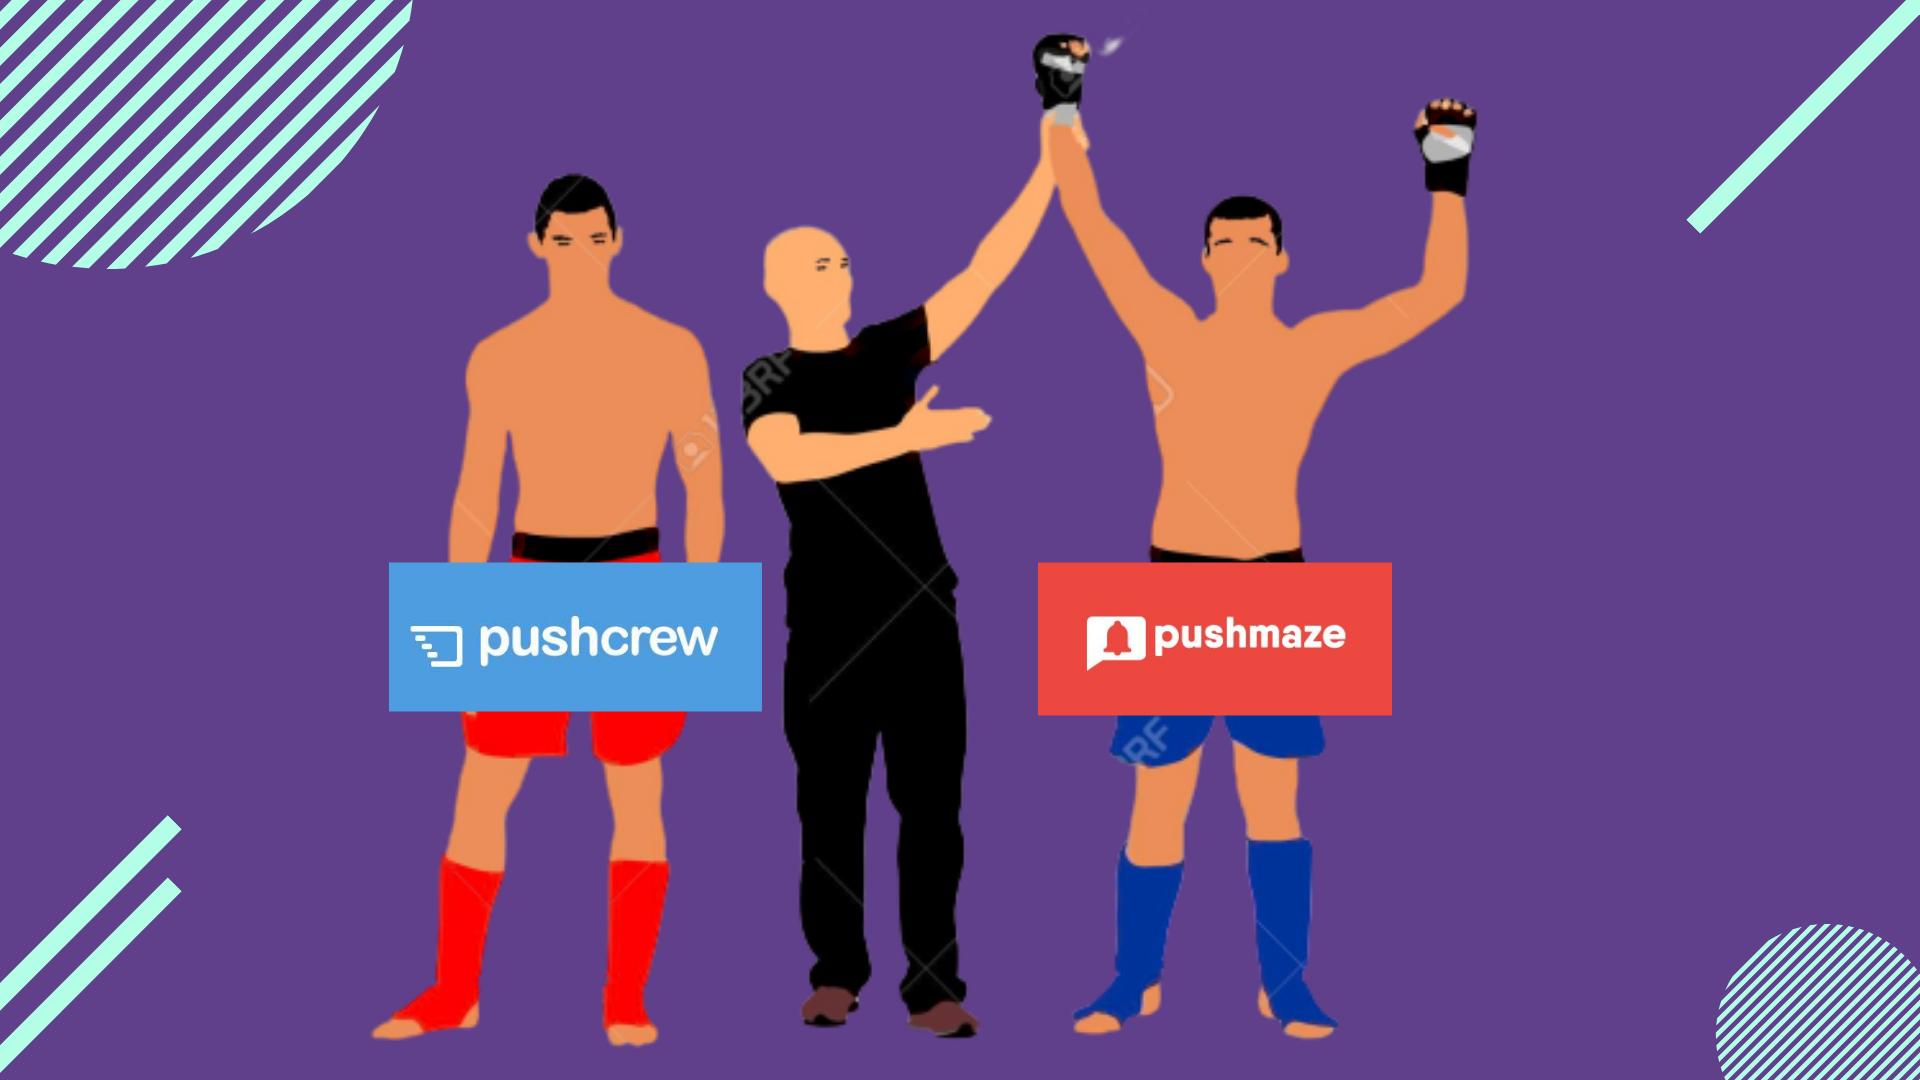 pushmaze comparison pushcrew